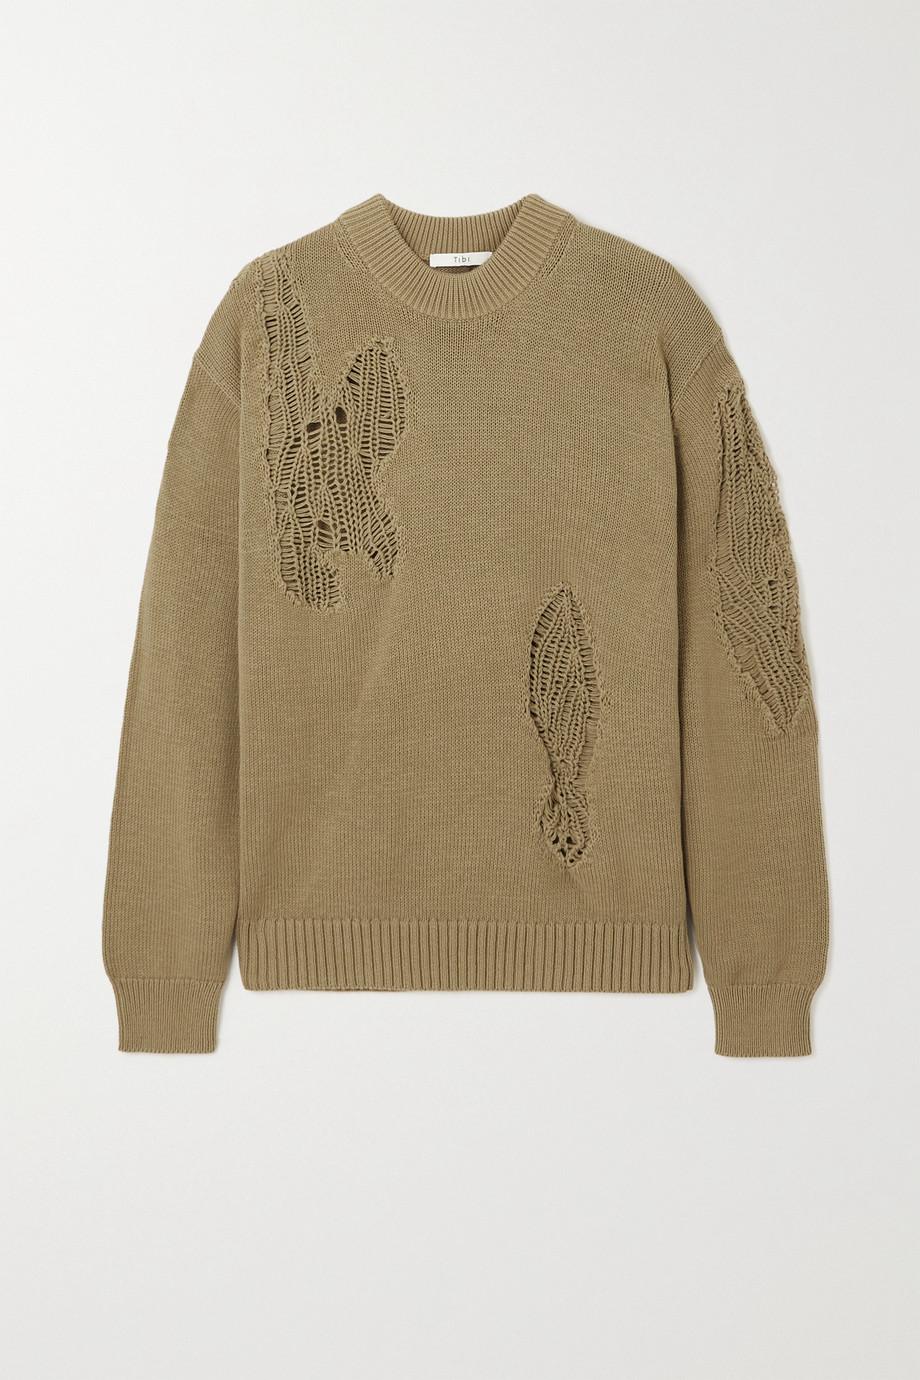 Tibi Distressed cotton sweater